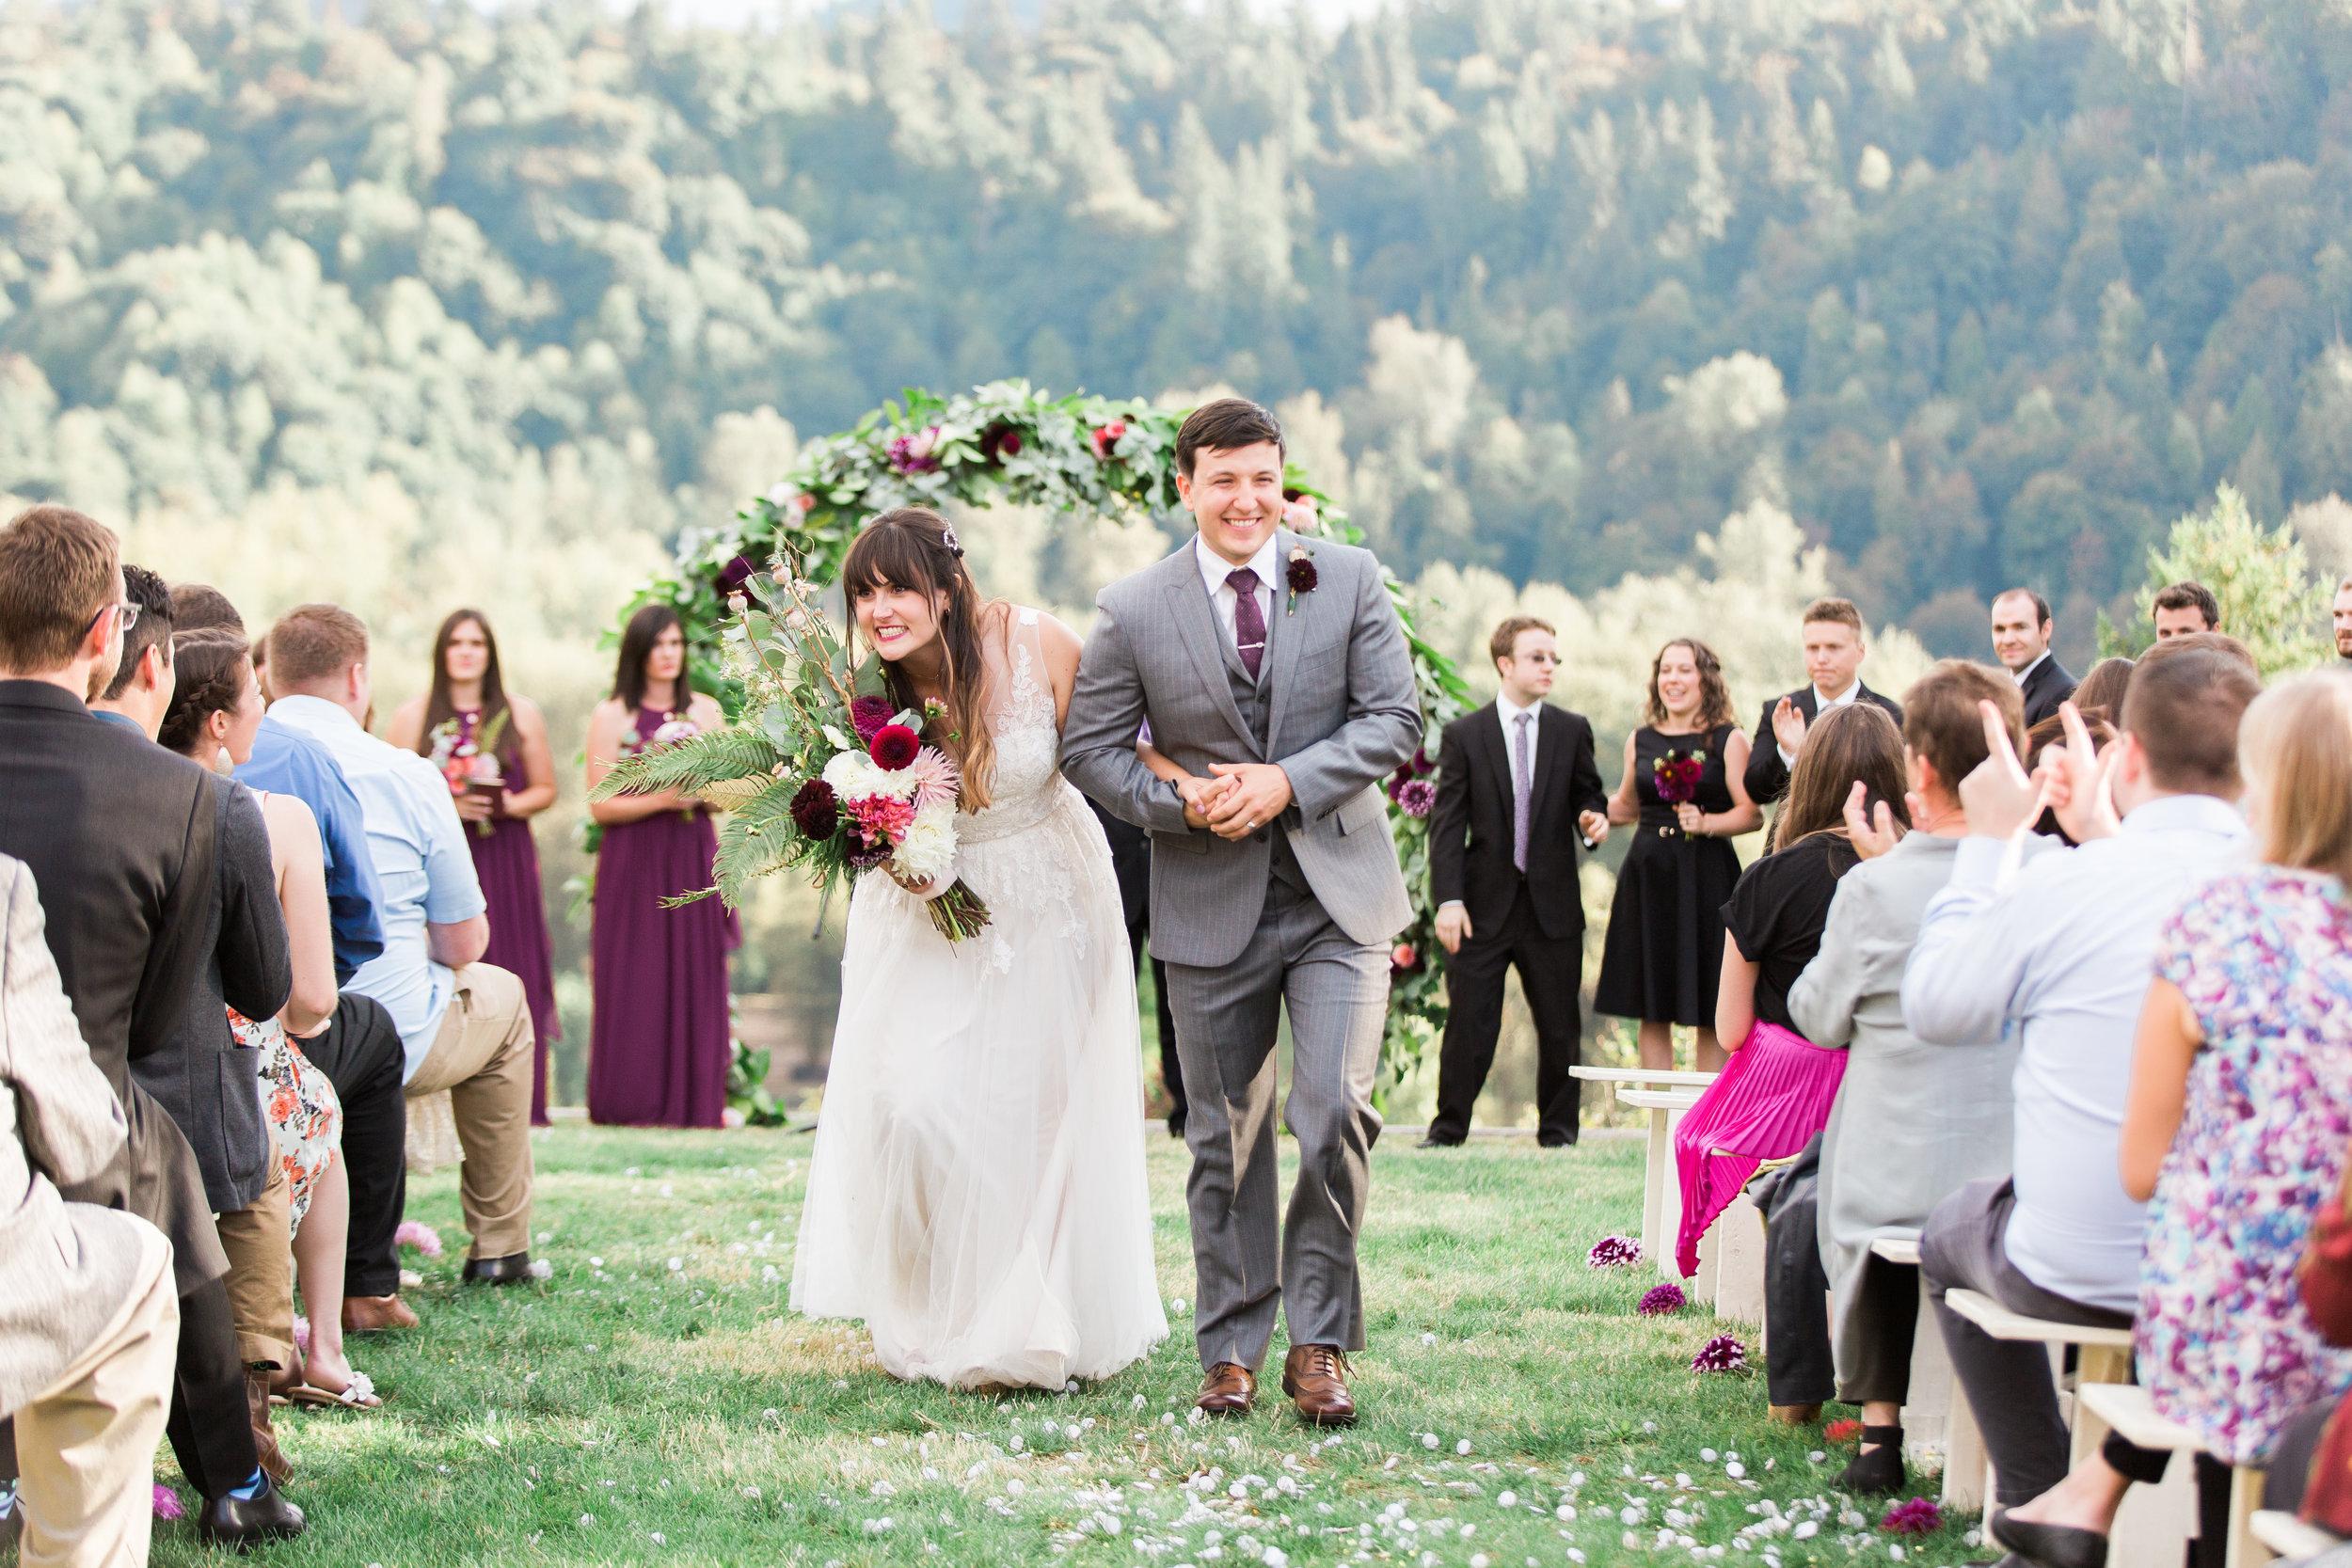 ceremony-kirsch jordt wedding-janelle elaine photography-279.jpg